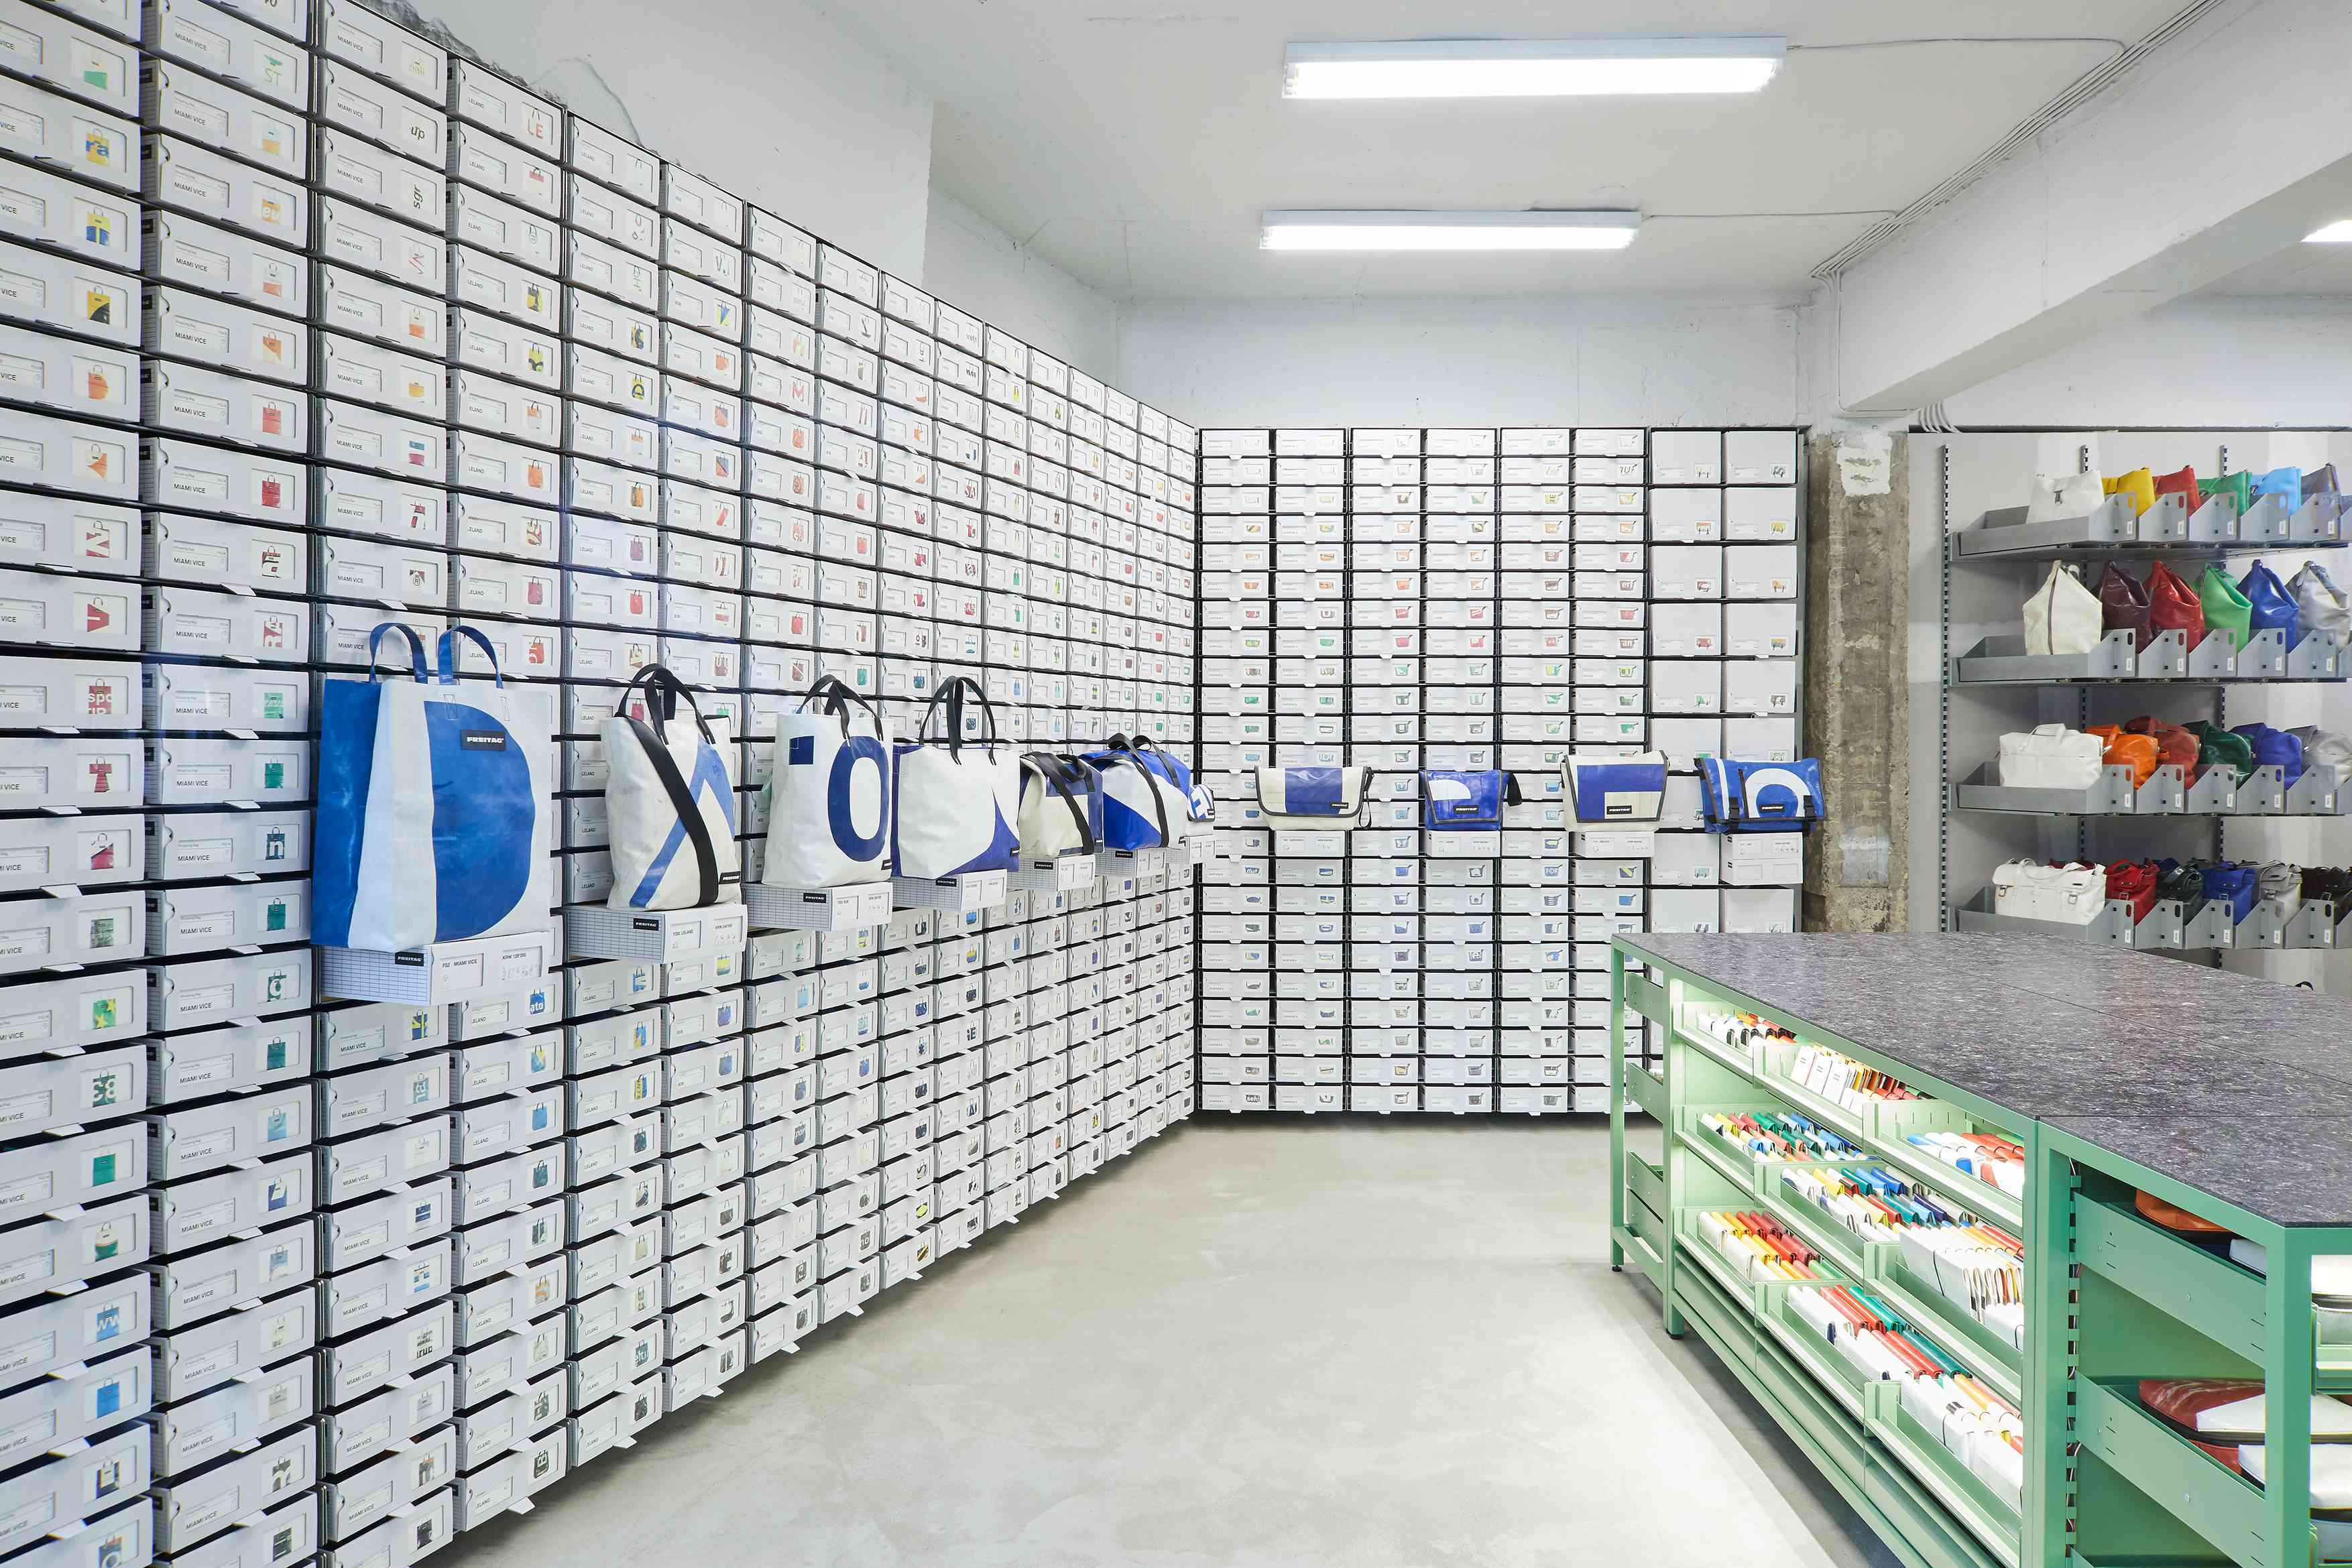 Freitag interior of store